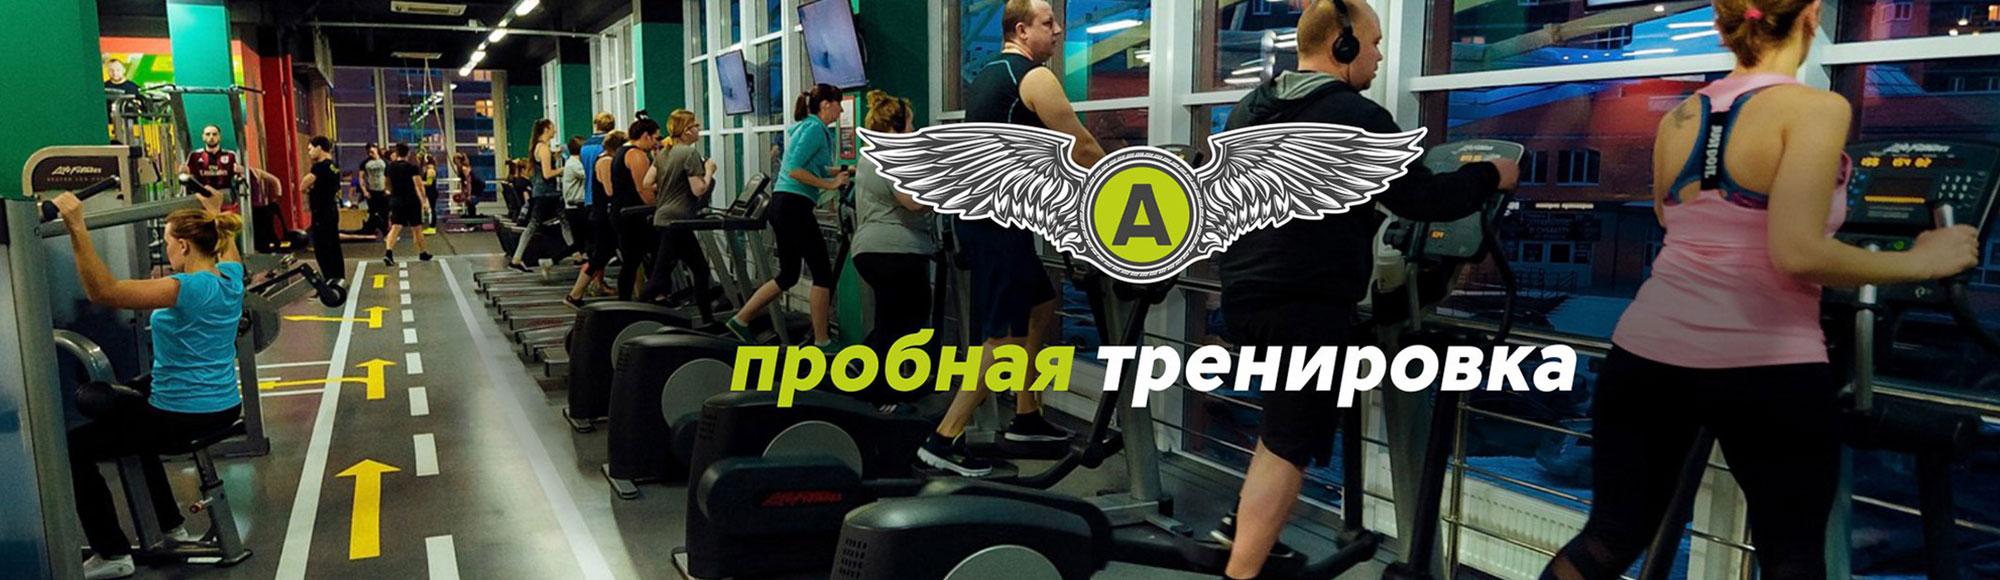 Agym Аэропорт